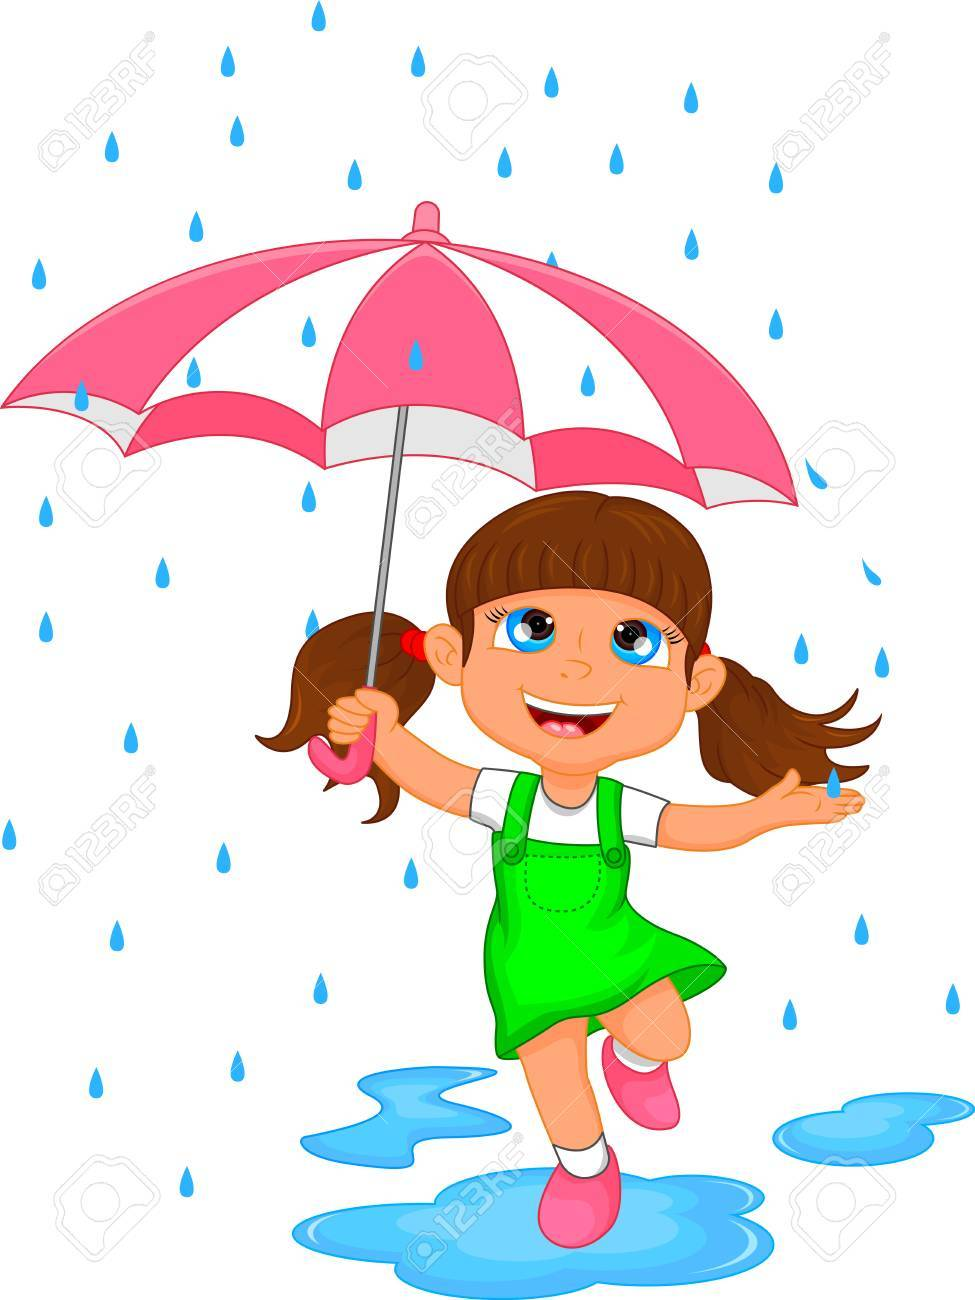 happy girl in rain with umbrella.